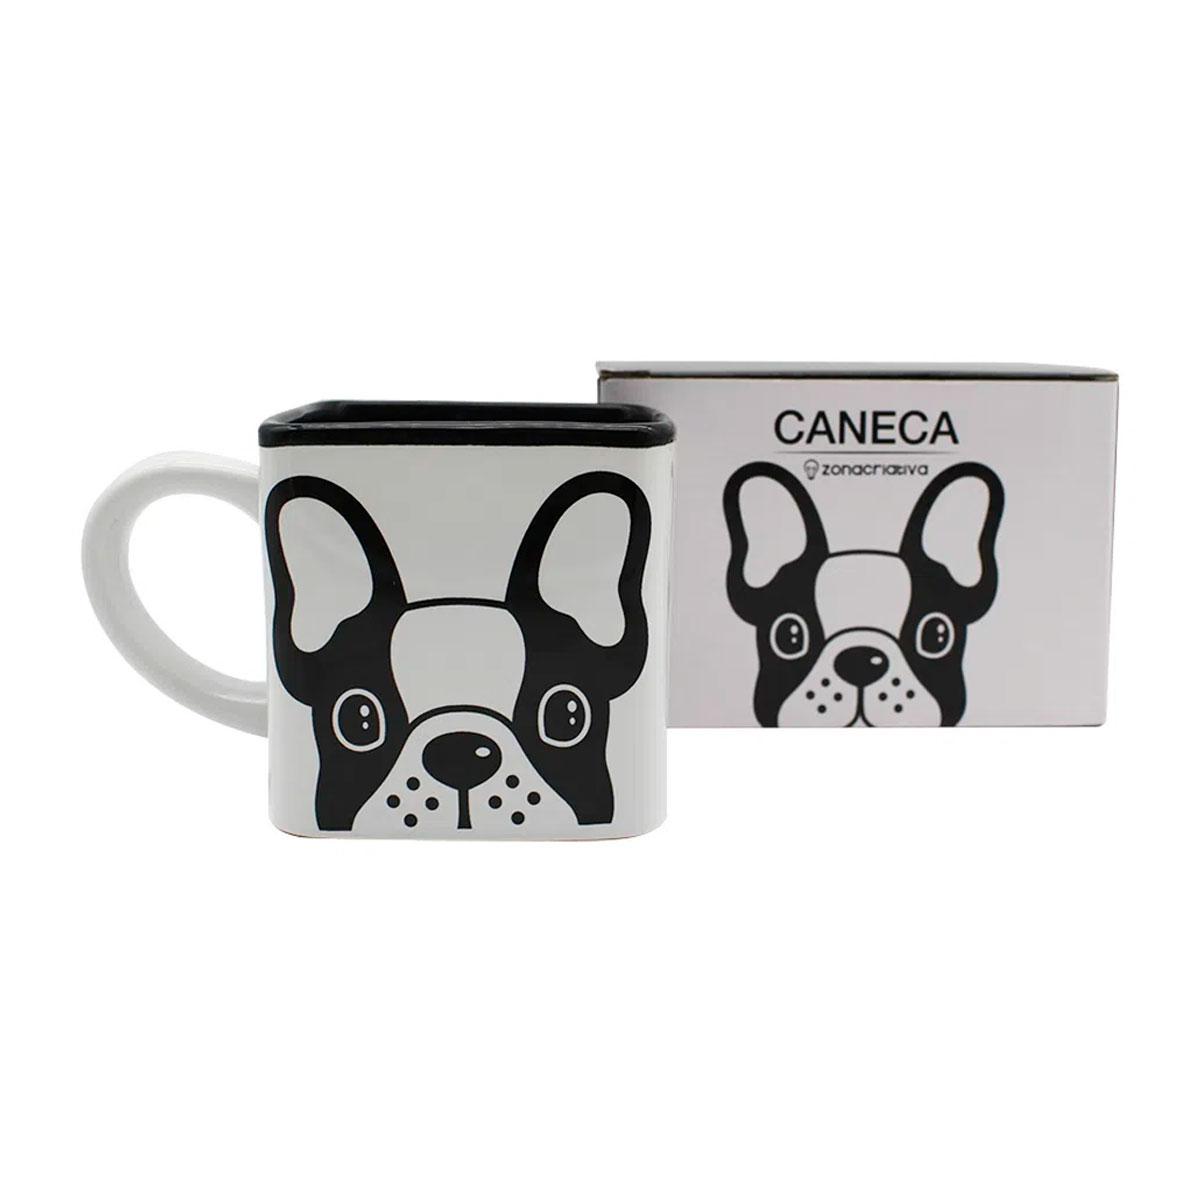 Caneca Quadrada Cubo Bulldog - Presente Super